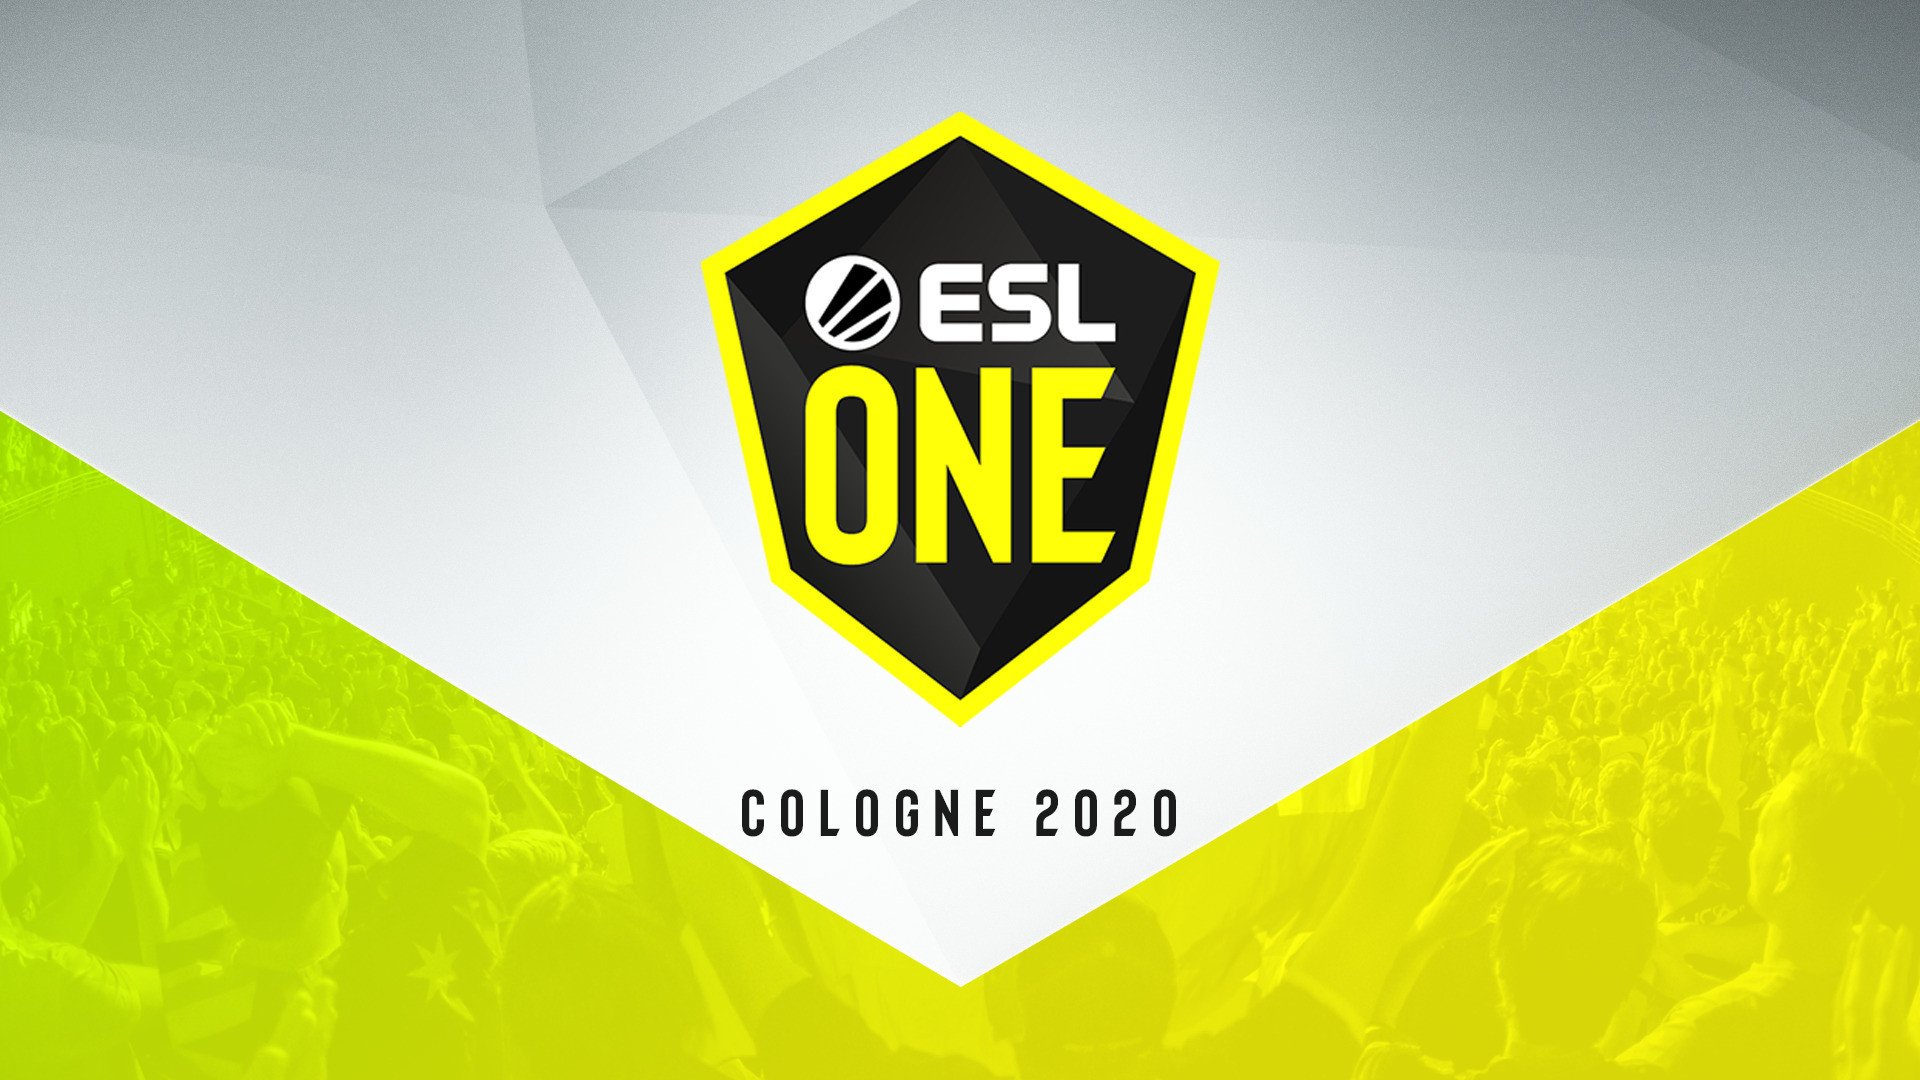 ESL One Cologne 2020 NA : EG l'emporte sur Liquid